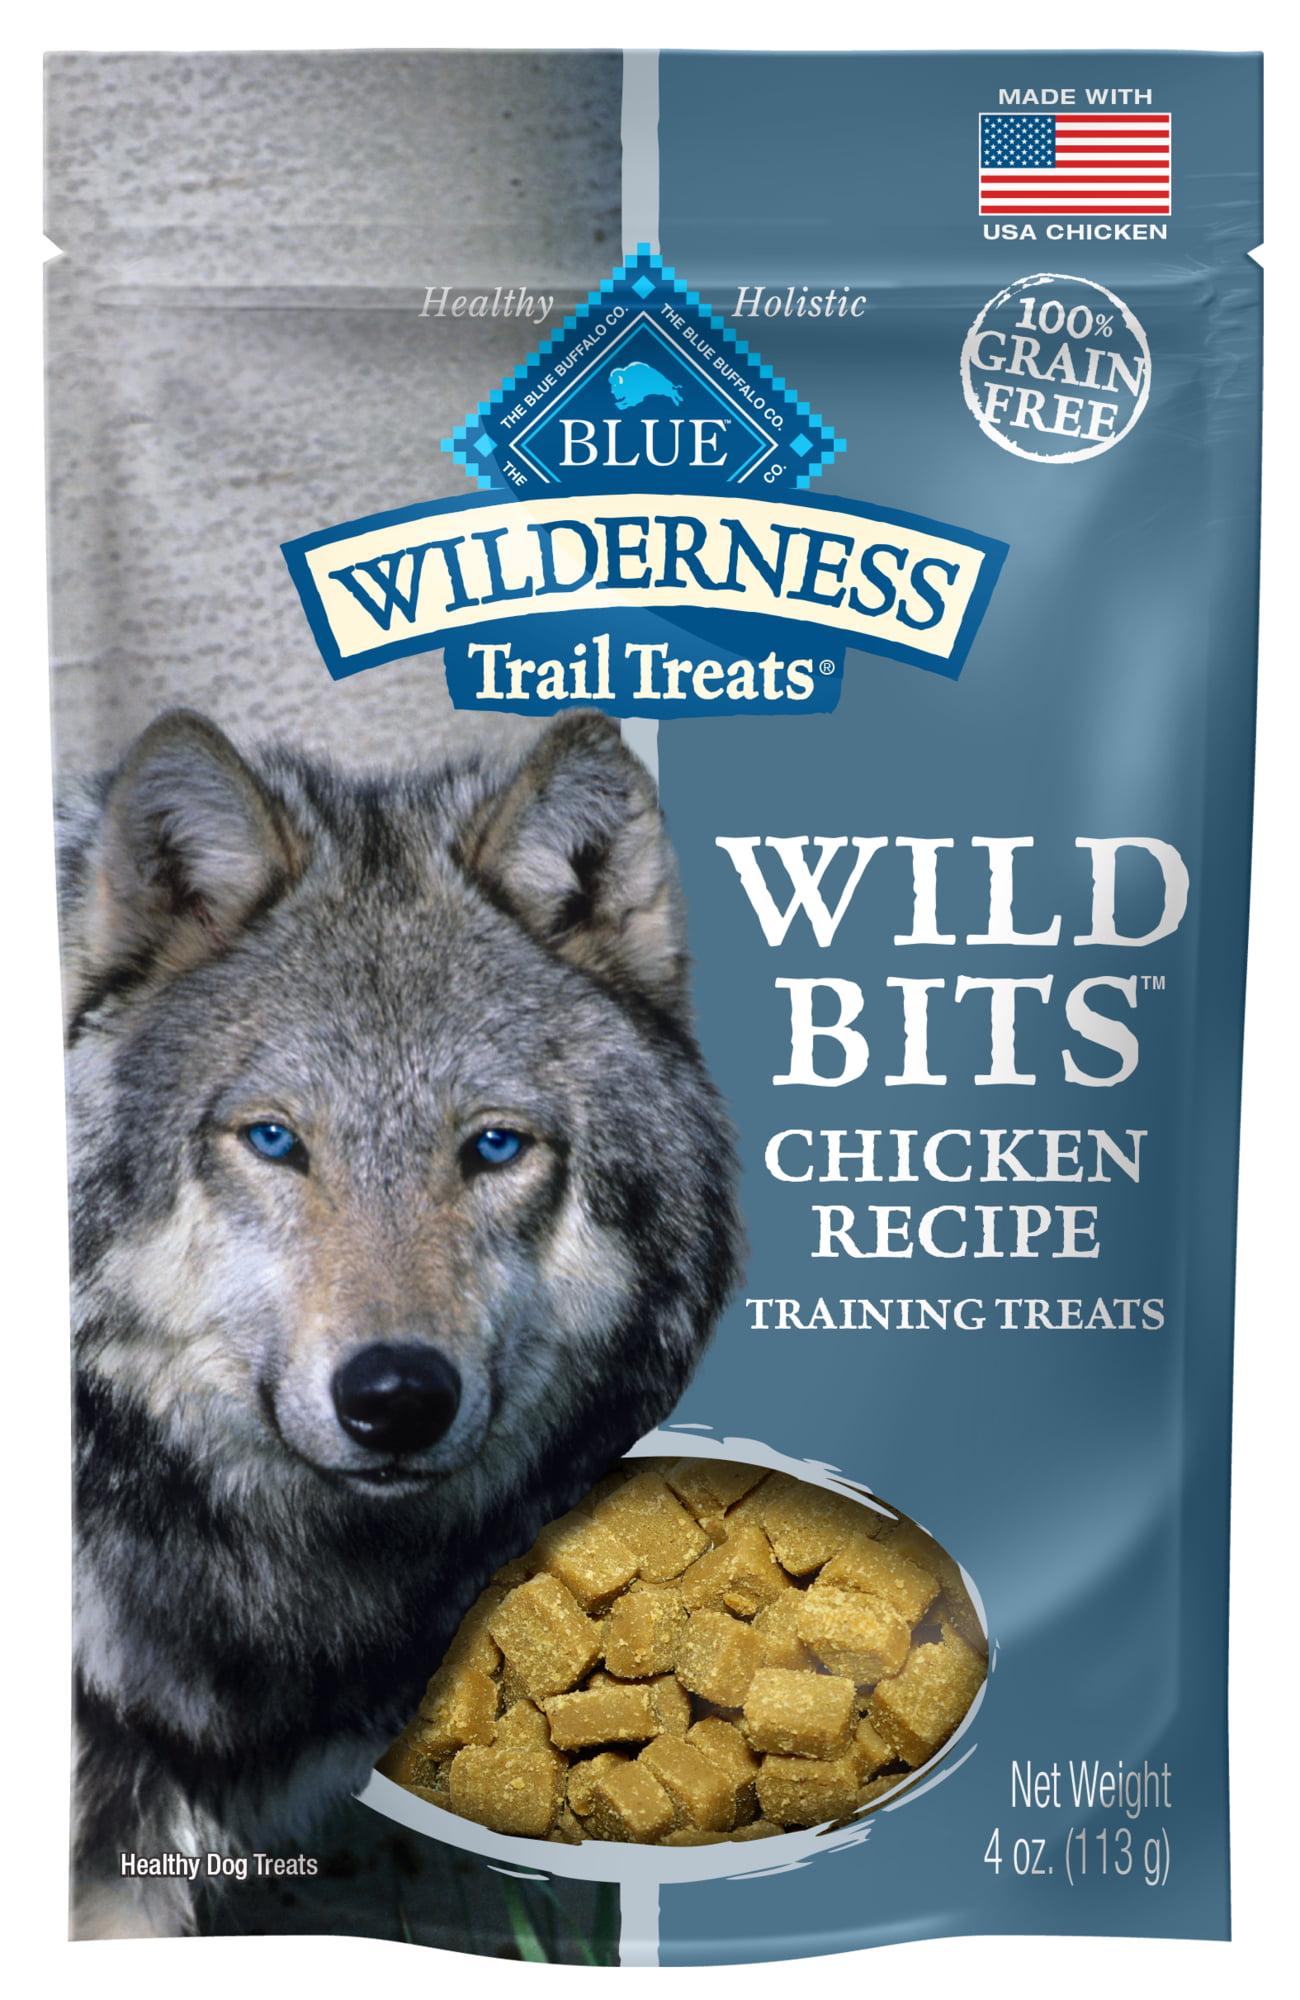 Blue Buffalo Wilderness Trail Treats Wild Bits Grain Free Soft-Moist Training Dog Treats, Chicken Recipe by Blue Buffalo